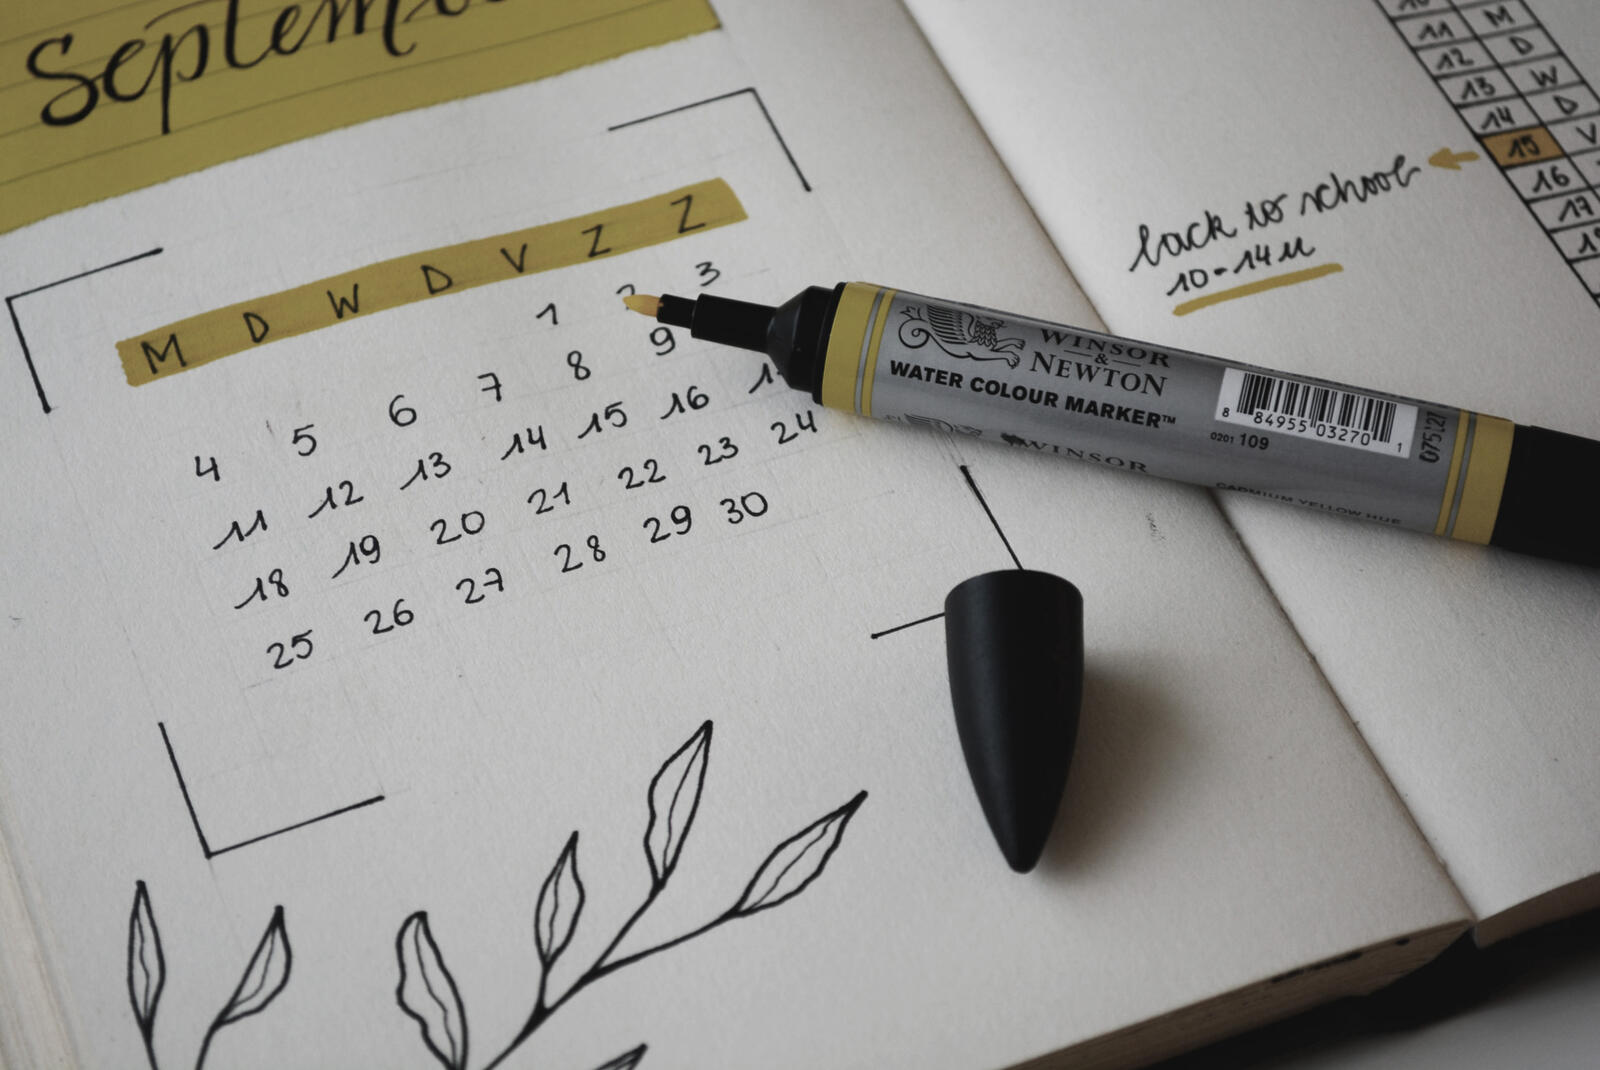 Terminkalendar mit markierten Tagen